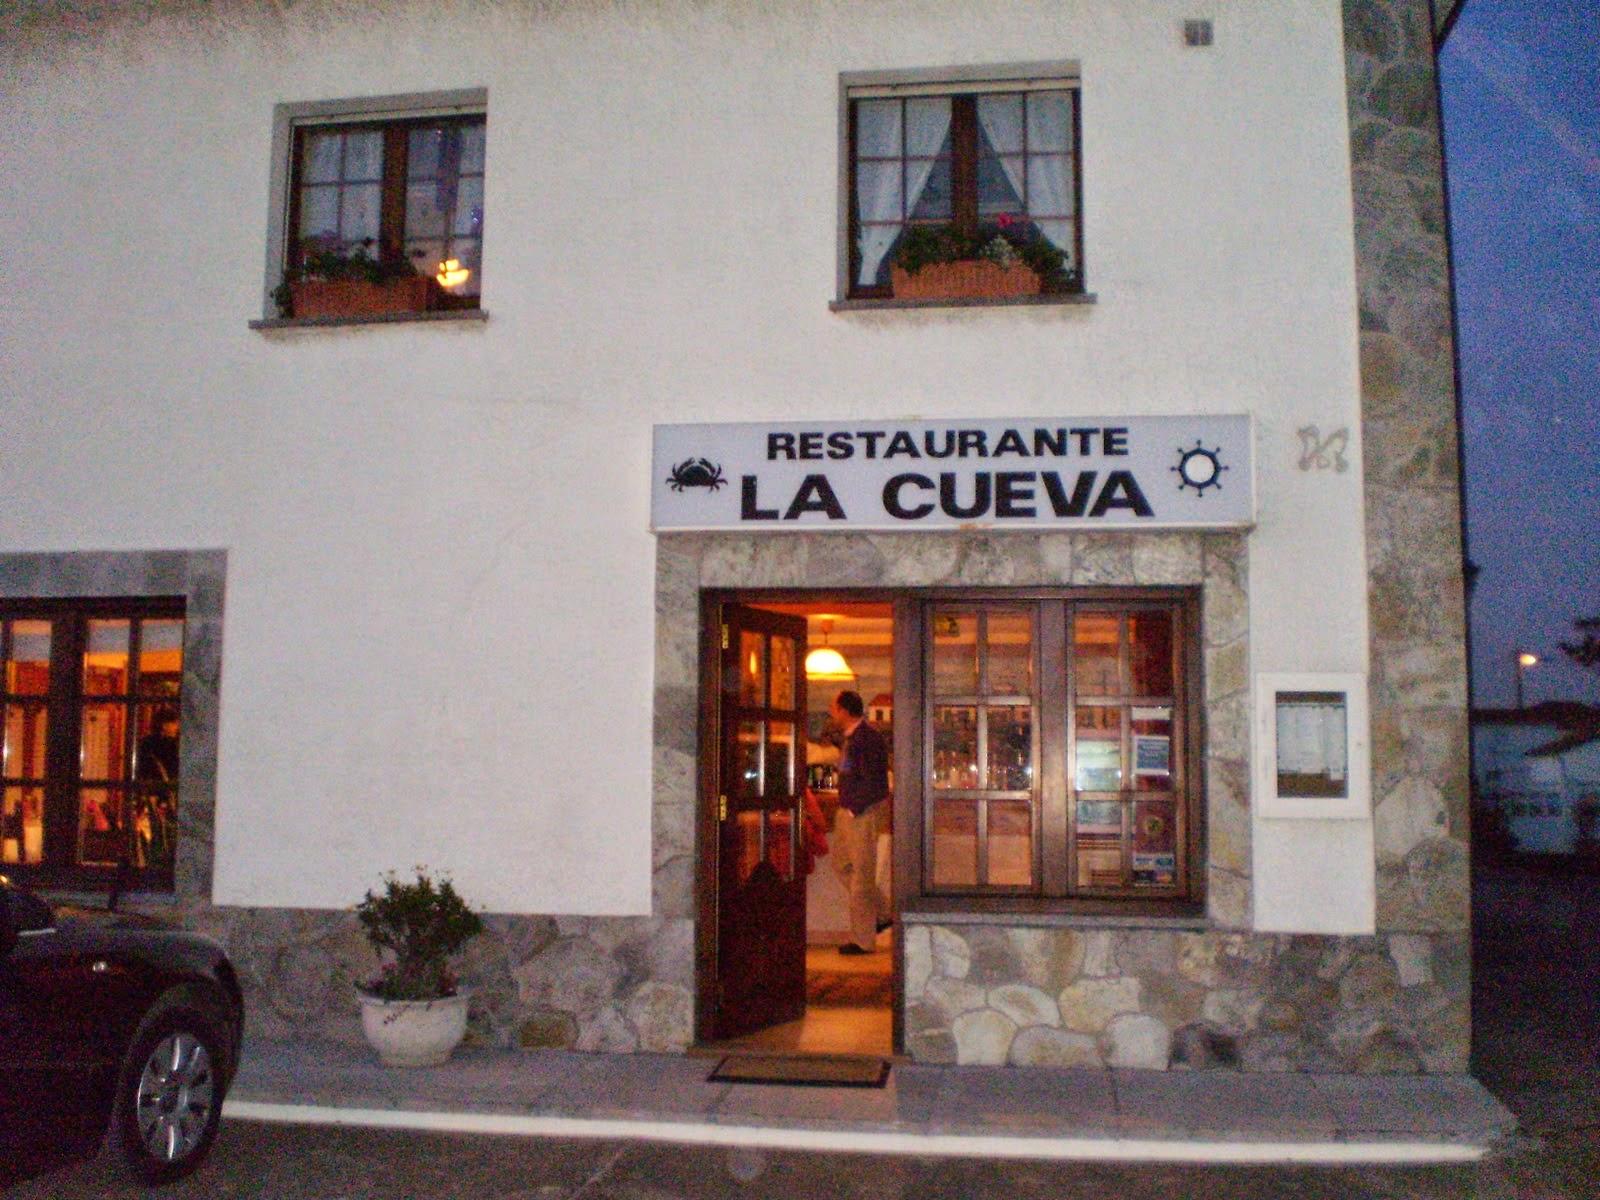 La gu a mikik n restaurante la cueva for Restaurante la cueva zamora